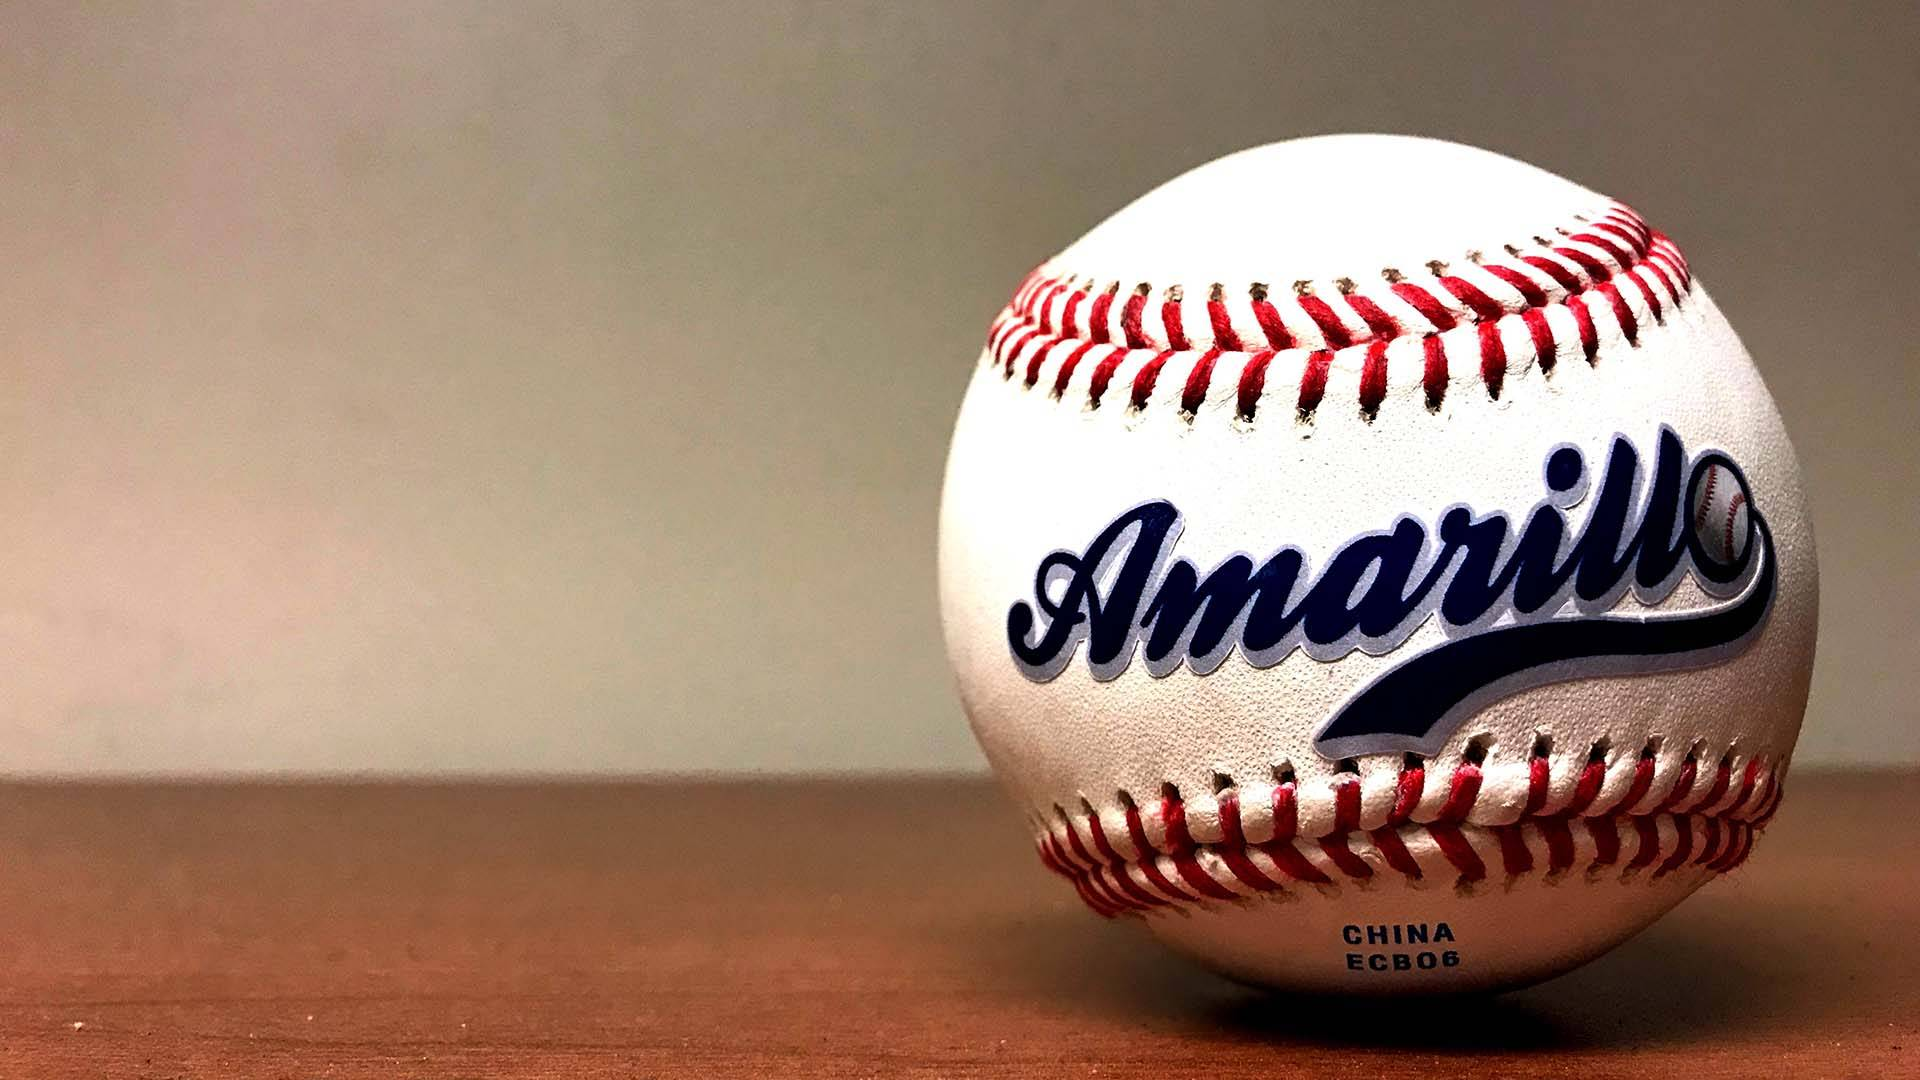 Amarillo baseball team finds its MLB partner